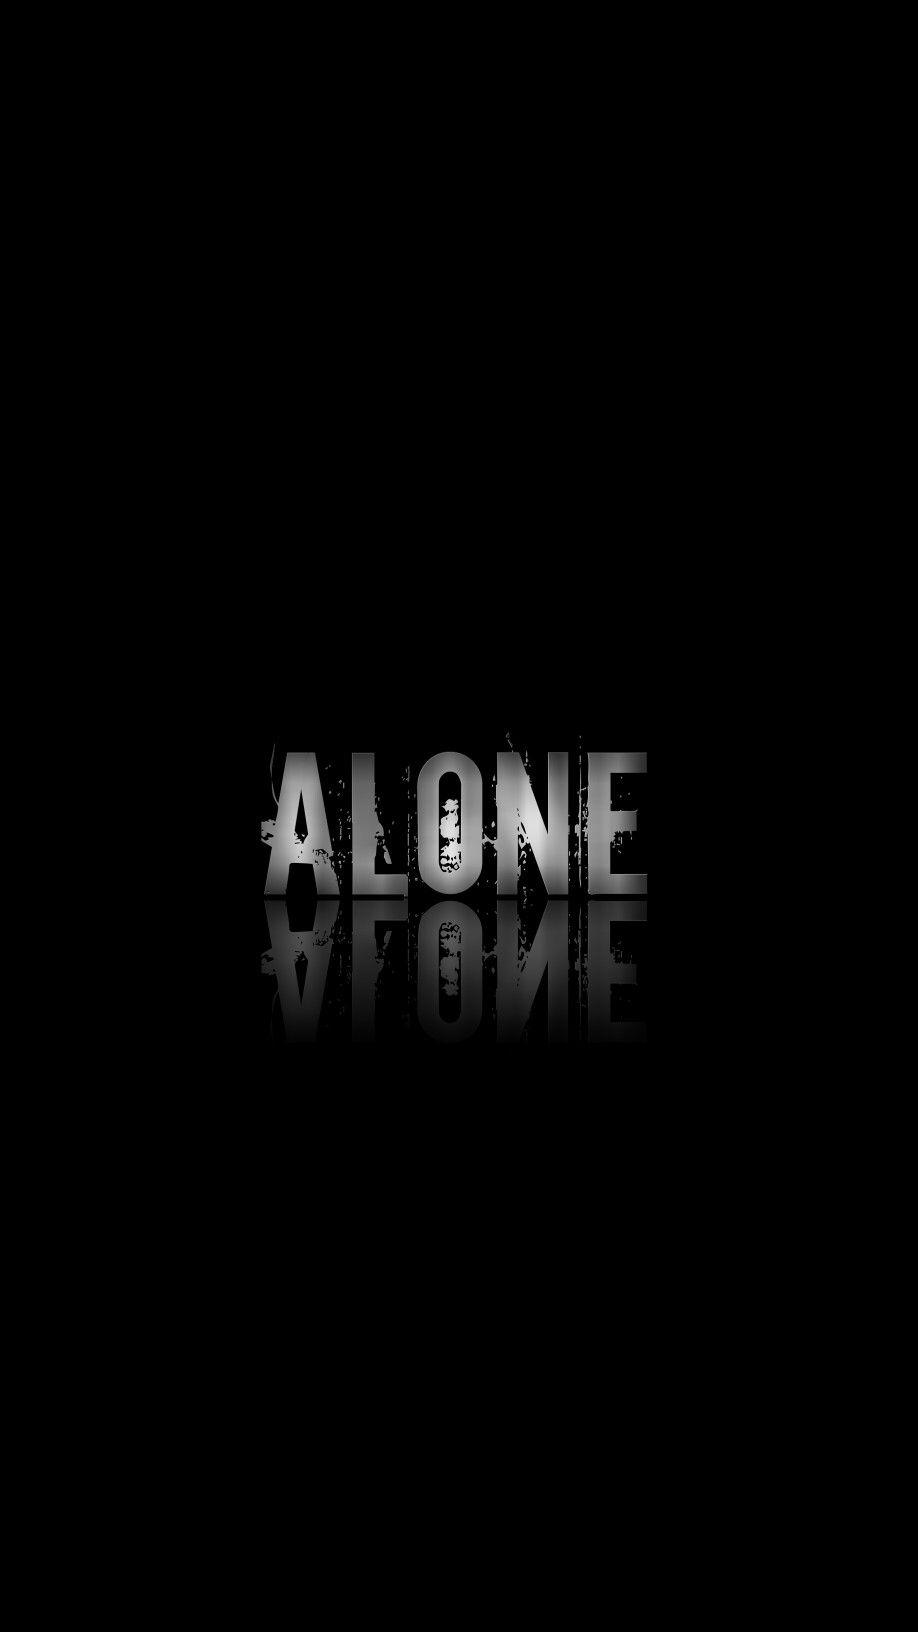 Pin On Alone